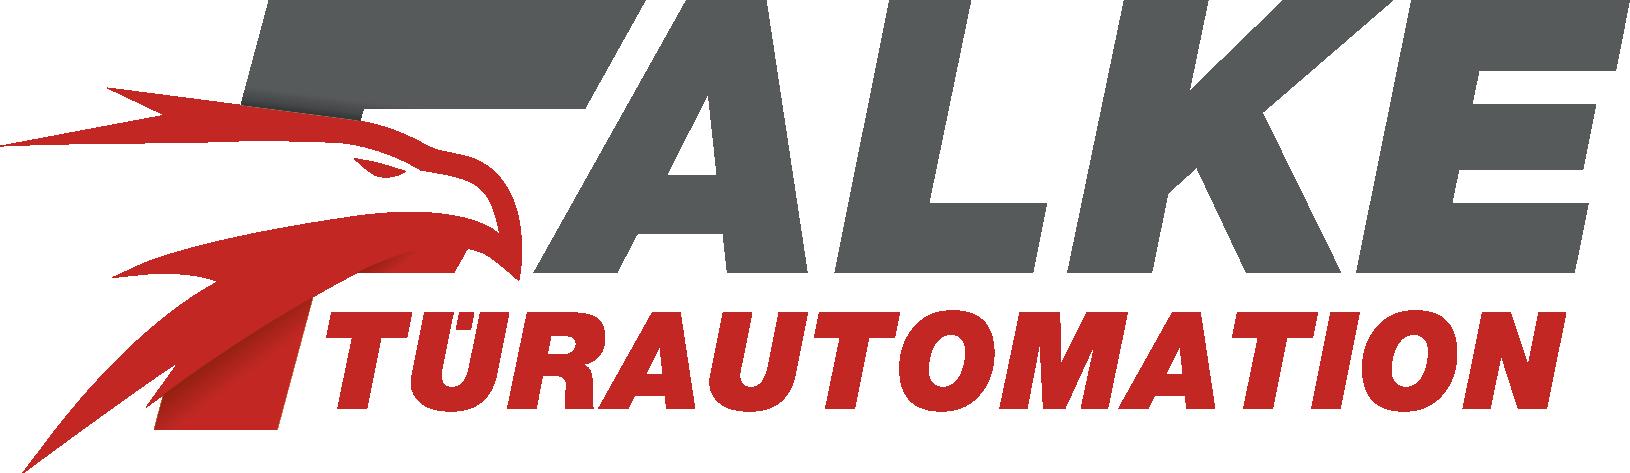 Falke Türautomation - Logo